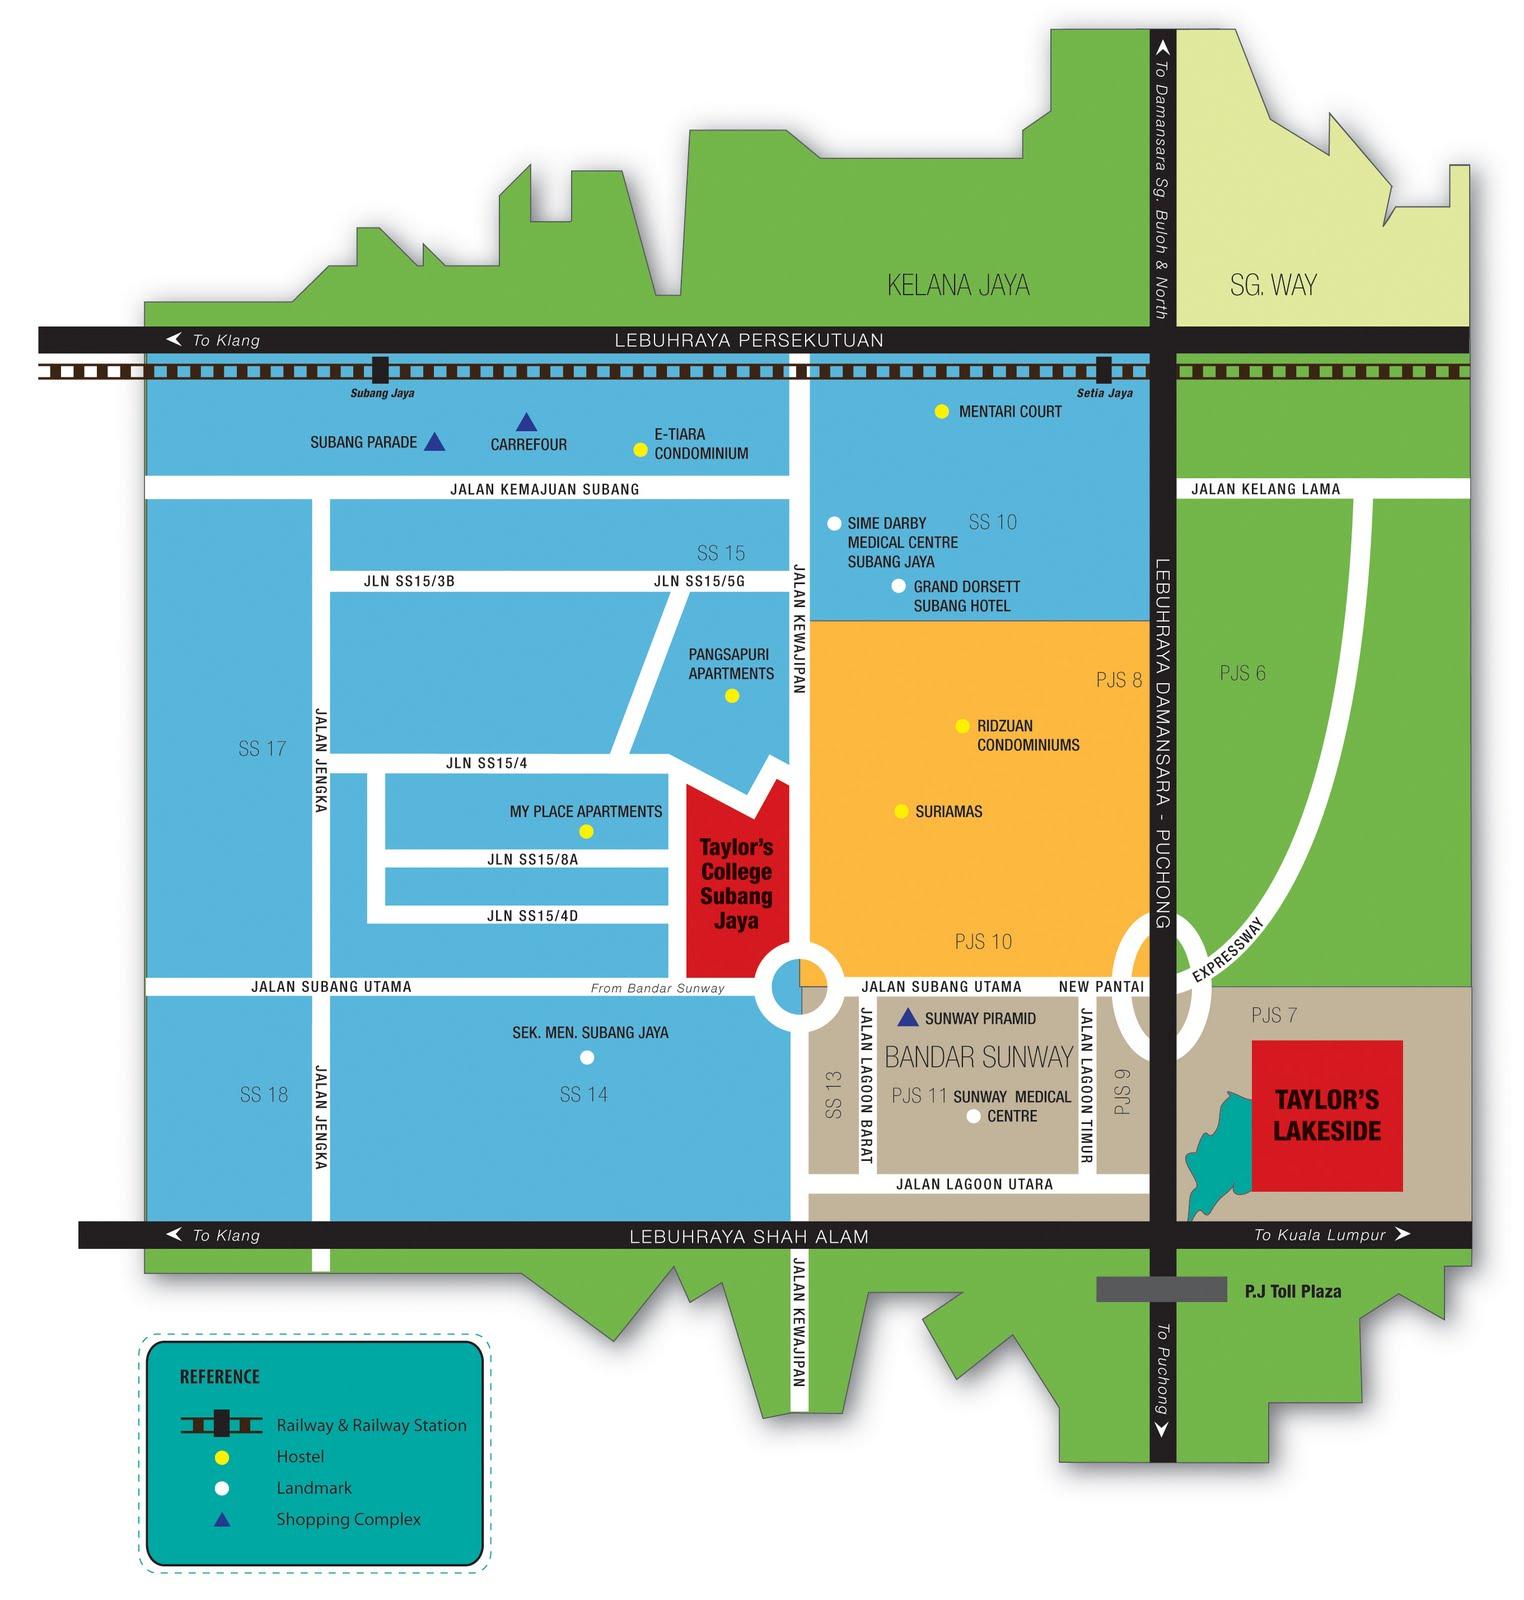 HEAR US OUT 6 MAP TO TAYLORS COLLEGE SUBANG JAYA